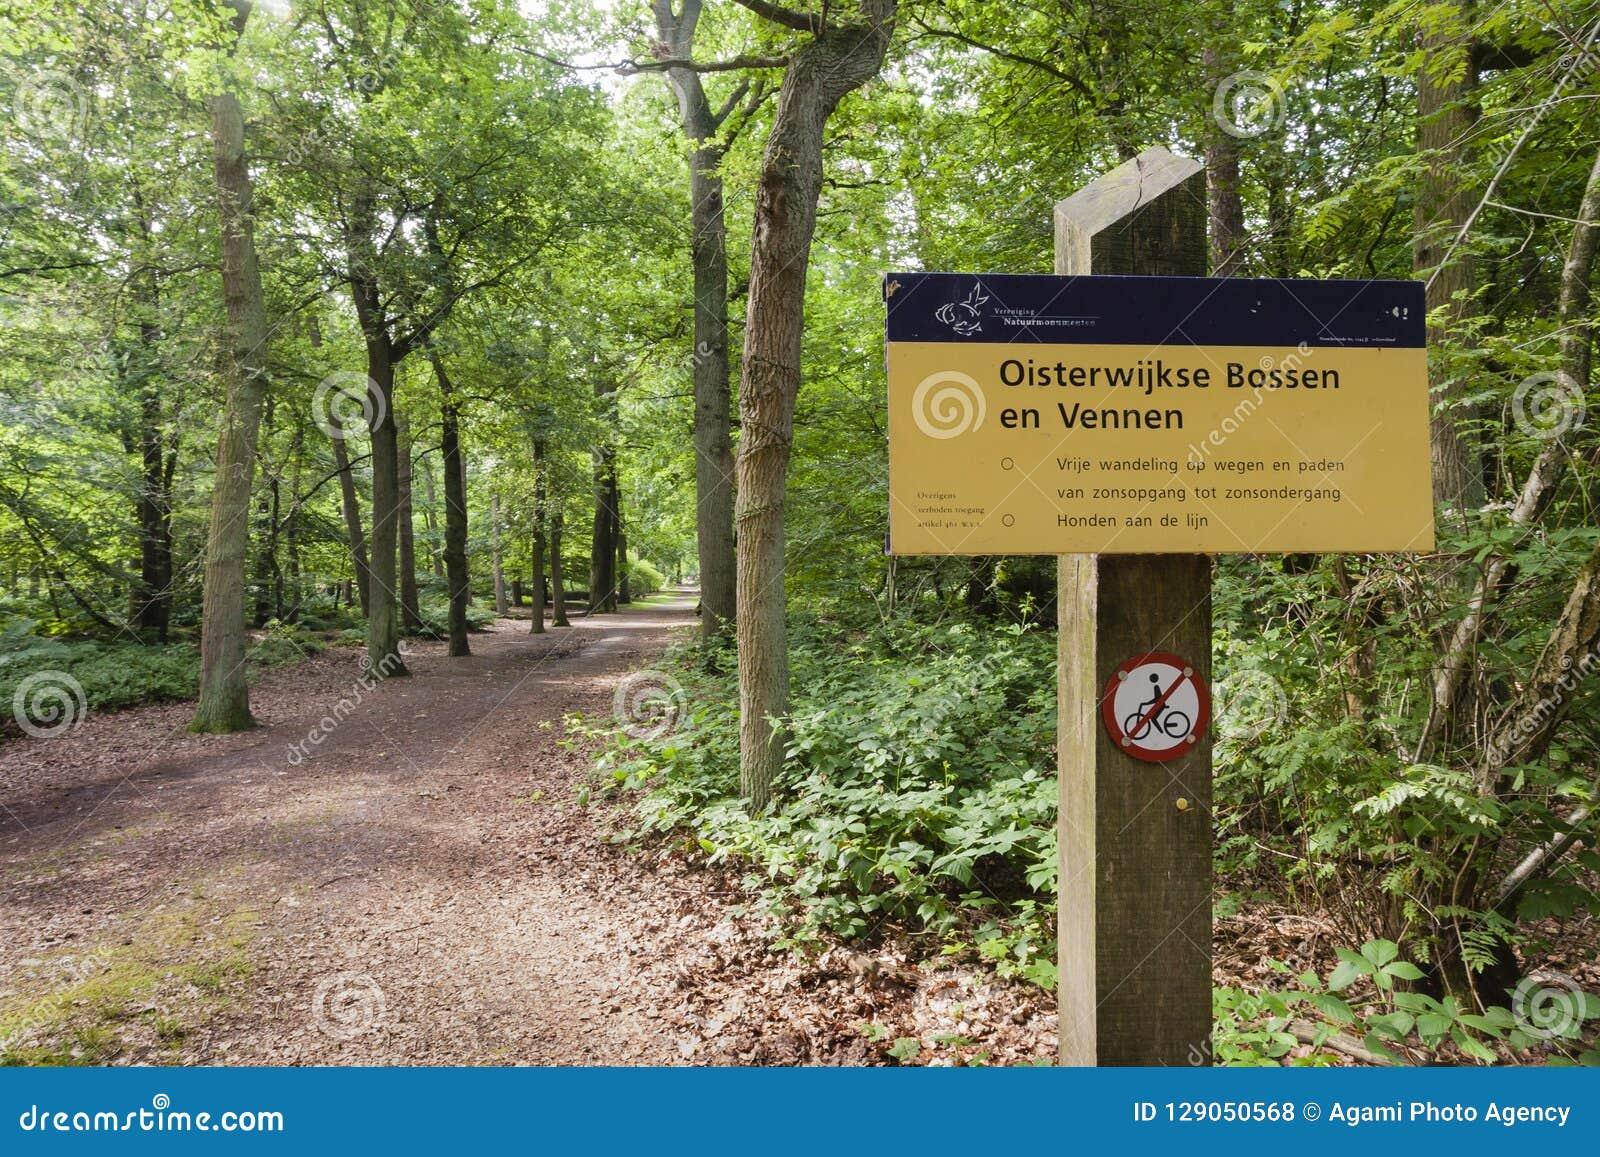 En Vennen de Oisterwijkse Bossen, bosques de Oisterwijk y pantanos